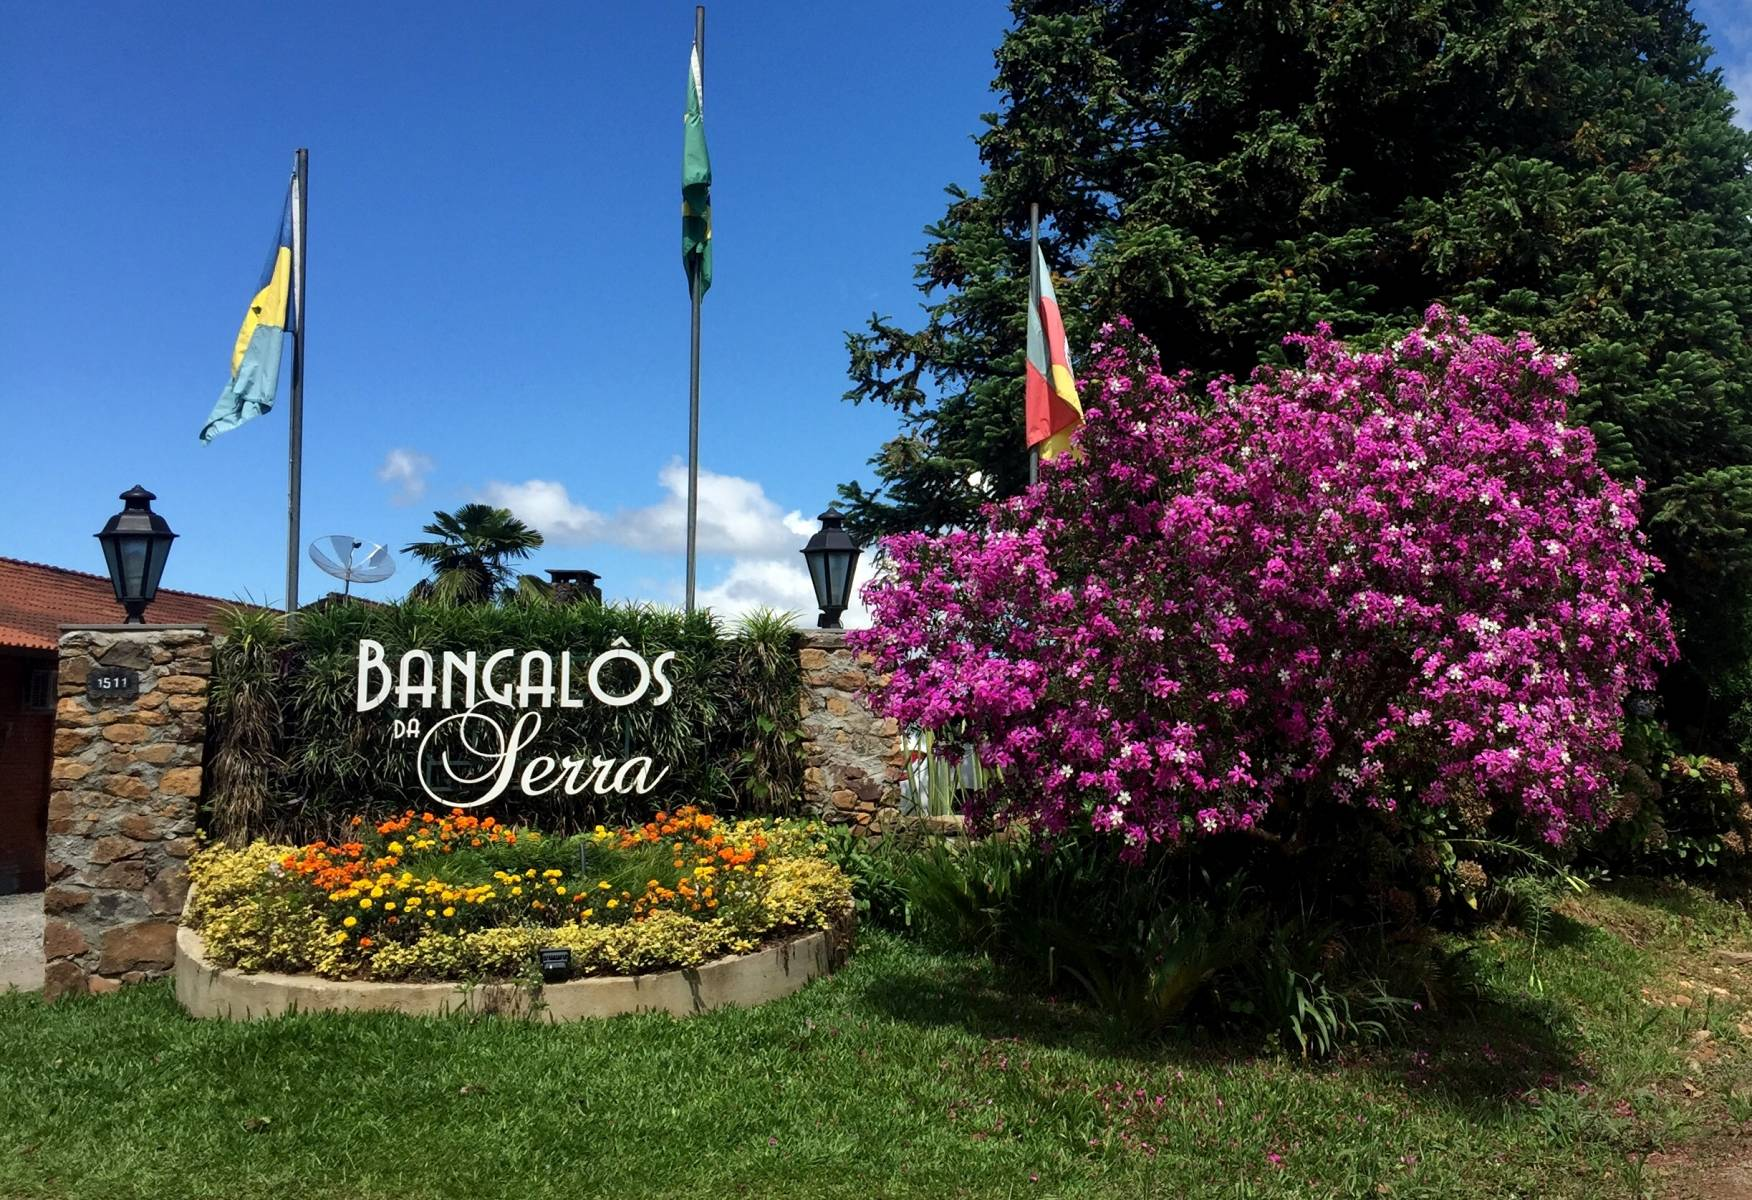 Entrada - Hotel Bangalôs da Serra #CurtaSuaFamilia #HotelSustentavel #TurismoVerde #TravelersChoice #EcoLider #Gramado